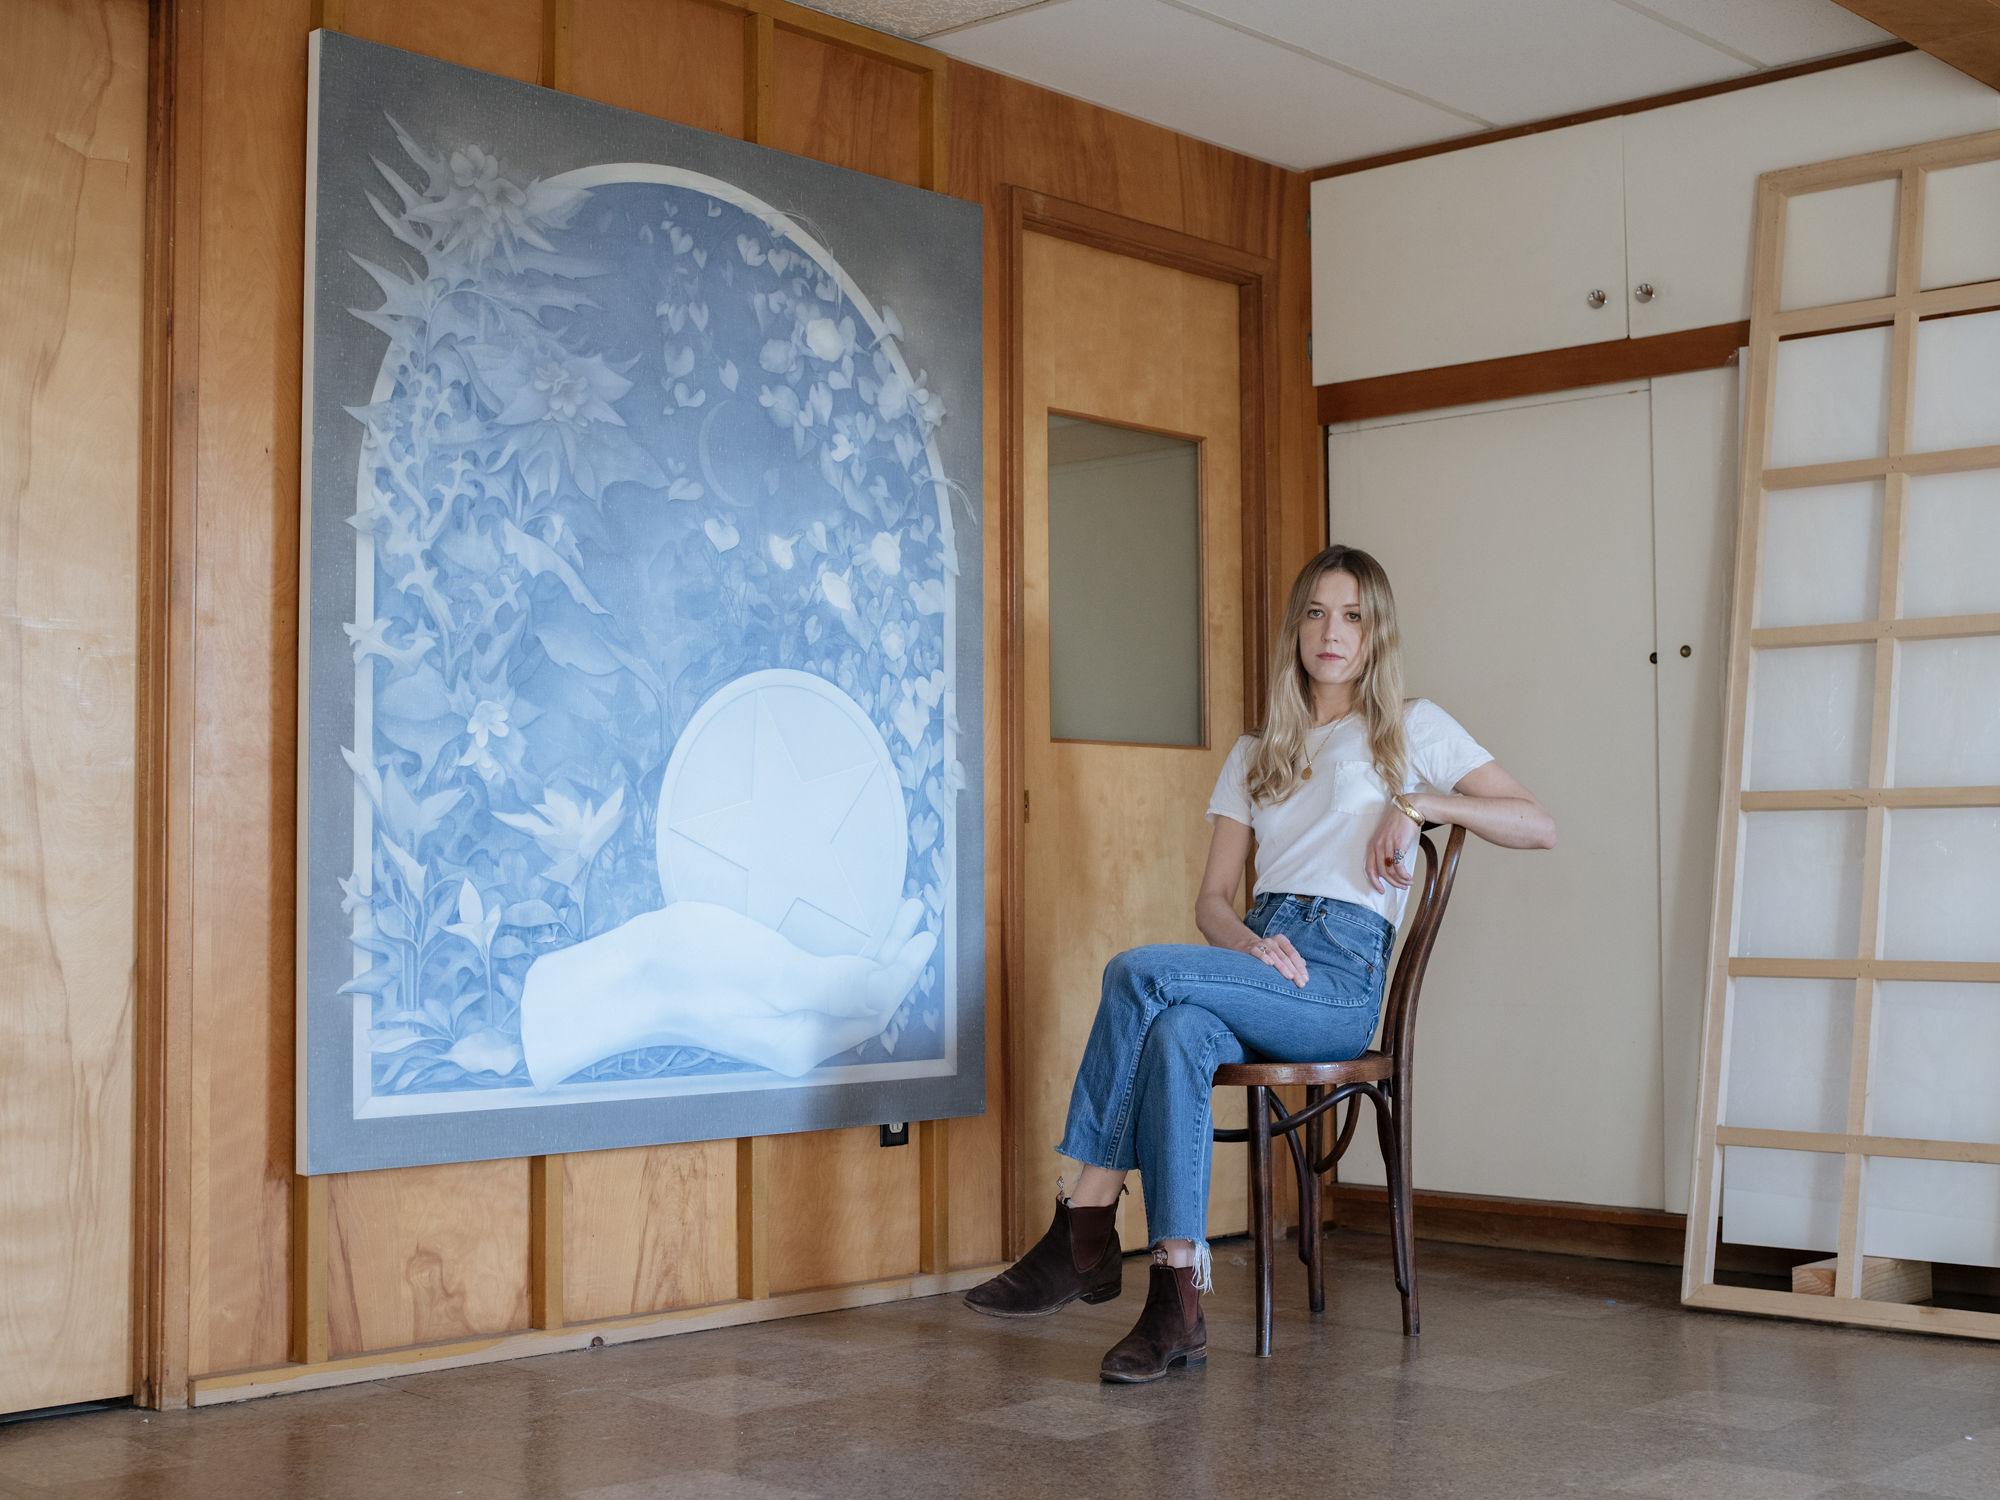 Theodora Allen's studio, photography by Max Knight